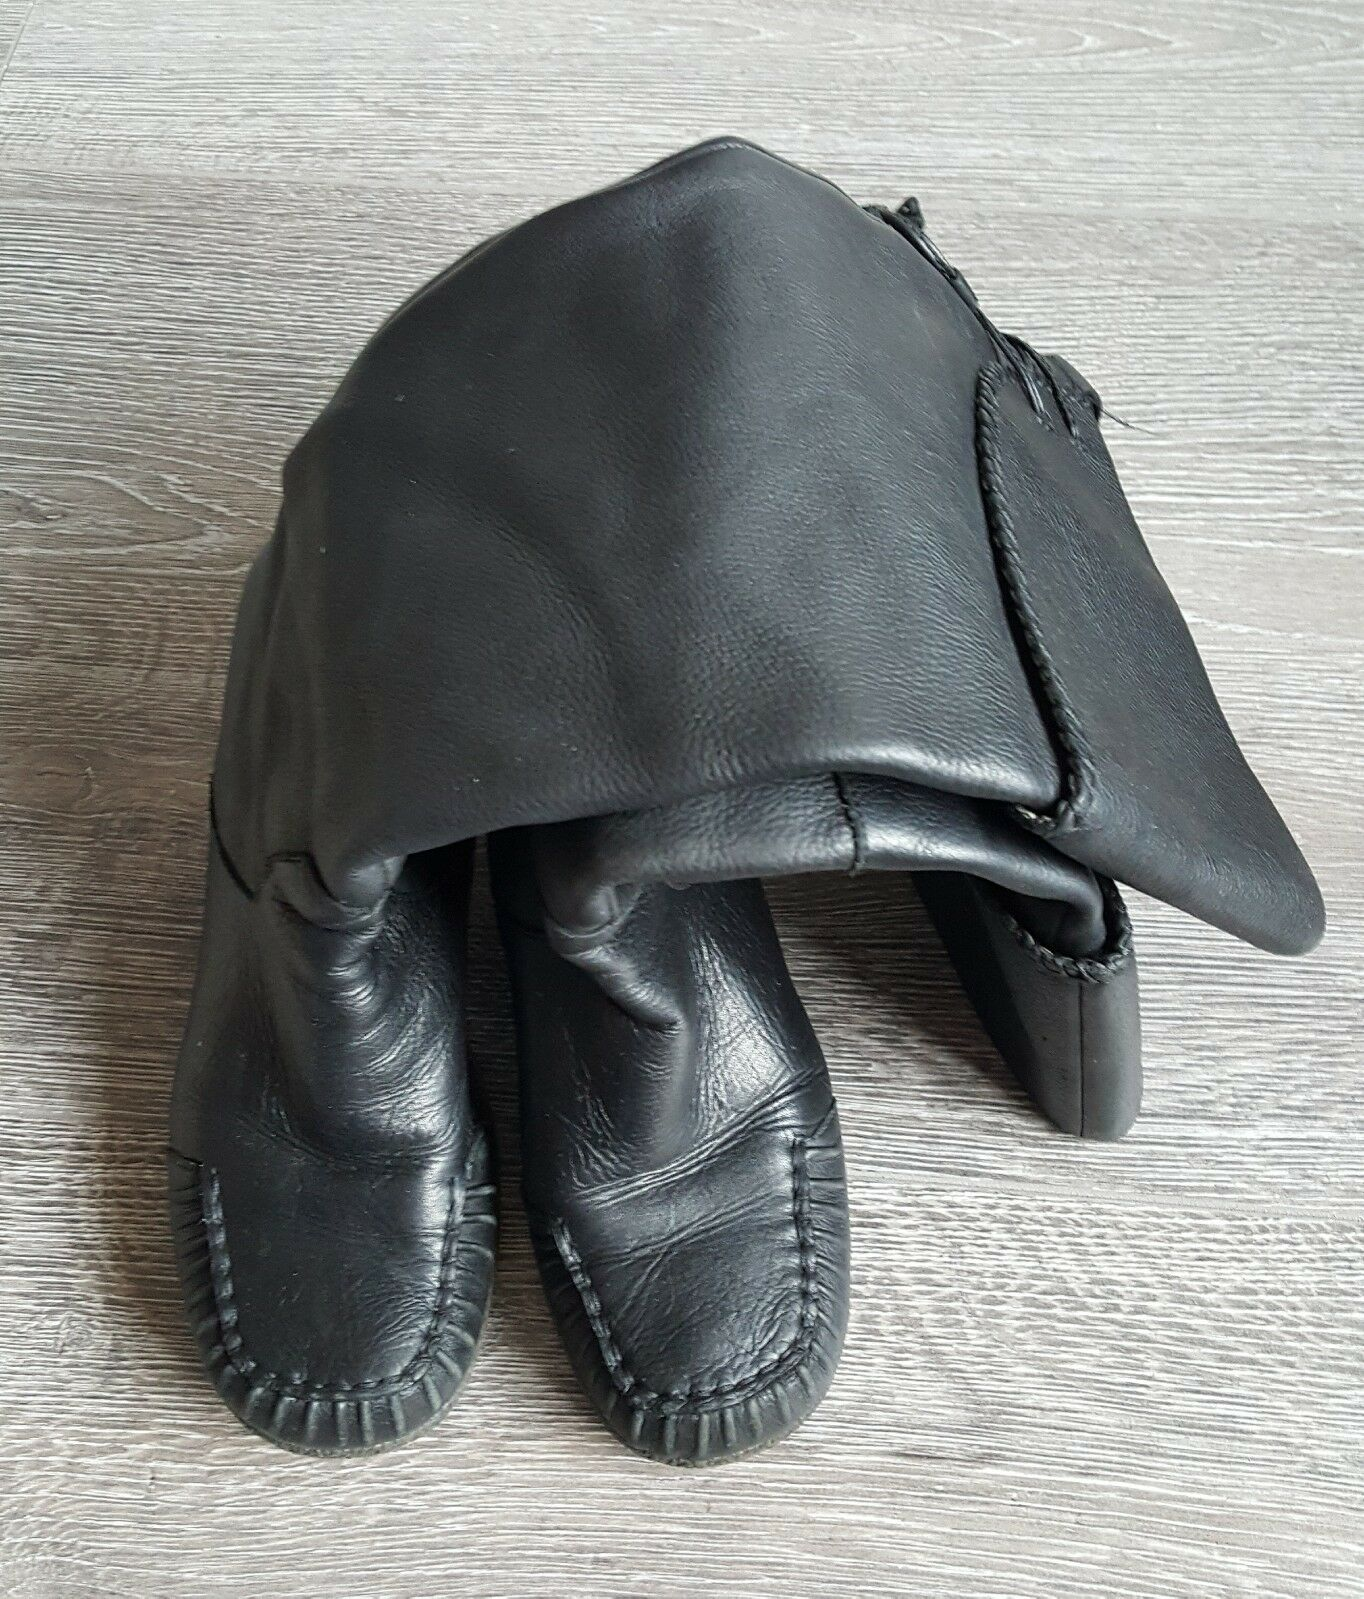 Clarks Clarks Clarks Genuine Leather Knee High Größe UK 6D damen Stiefel schuhe Heels 7aba79